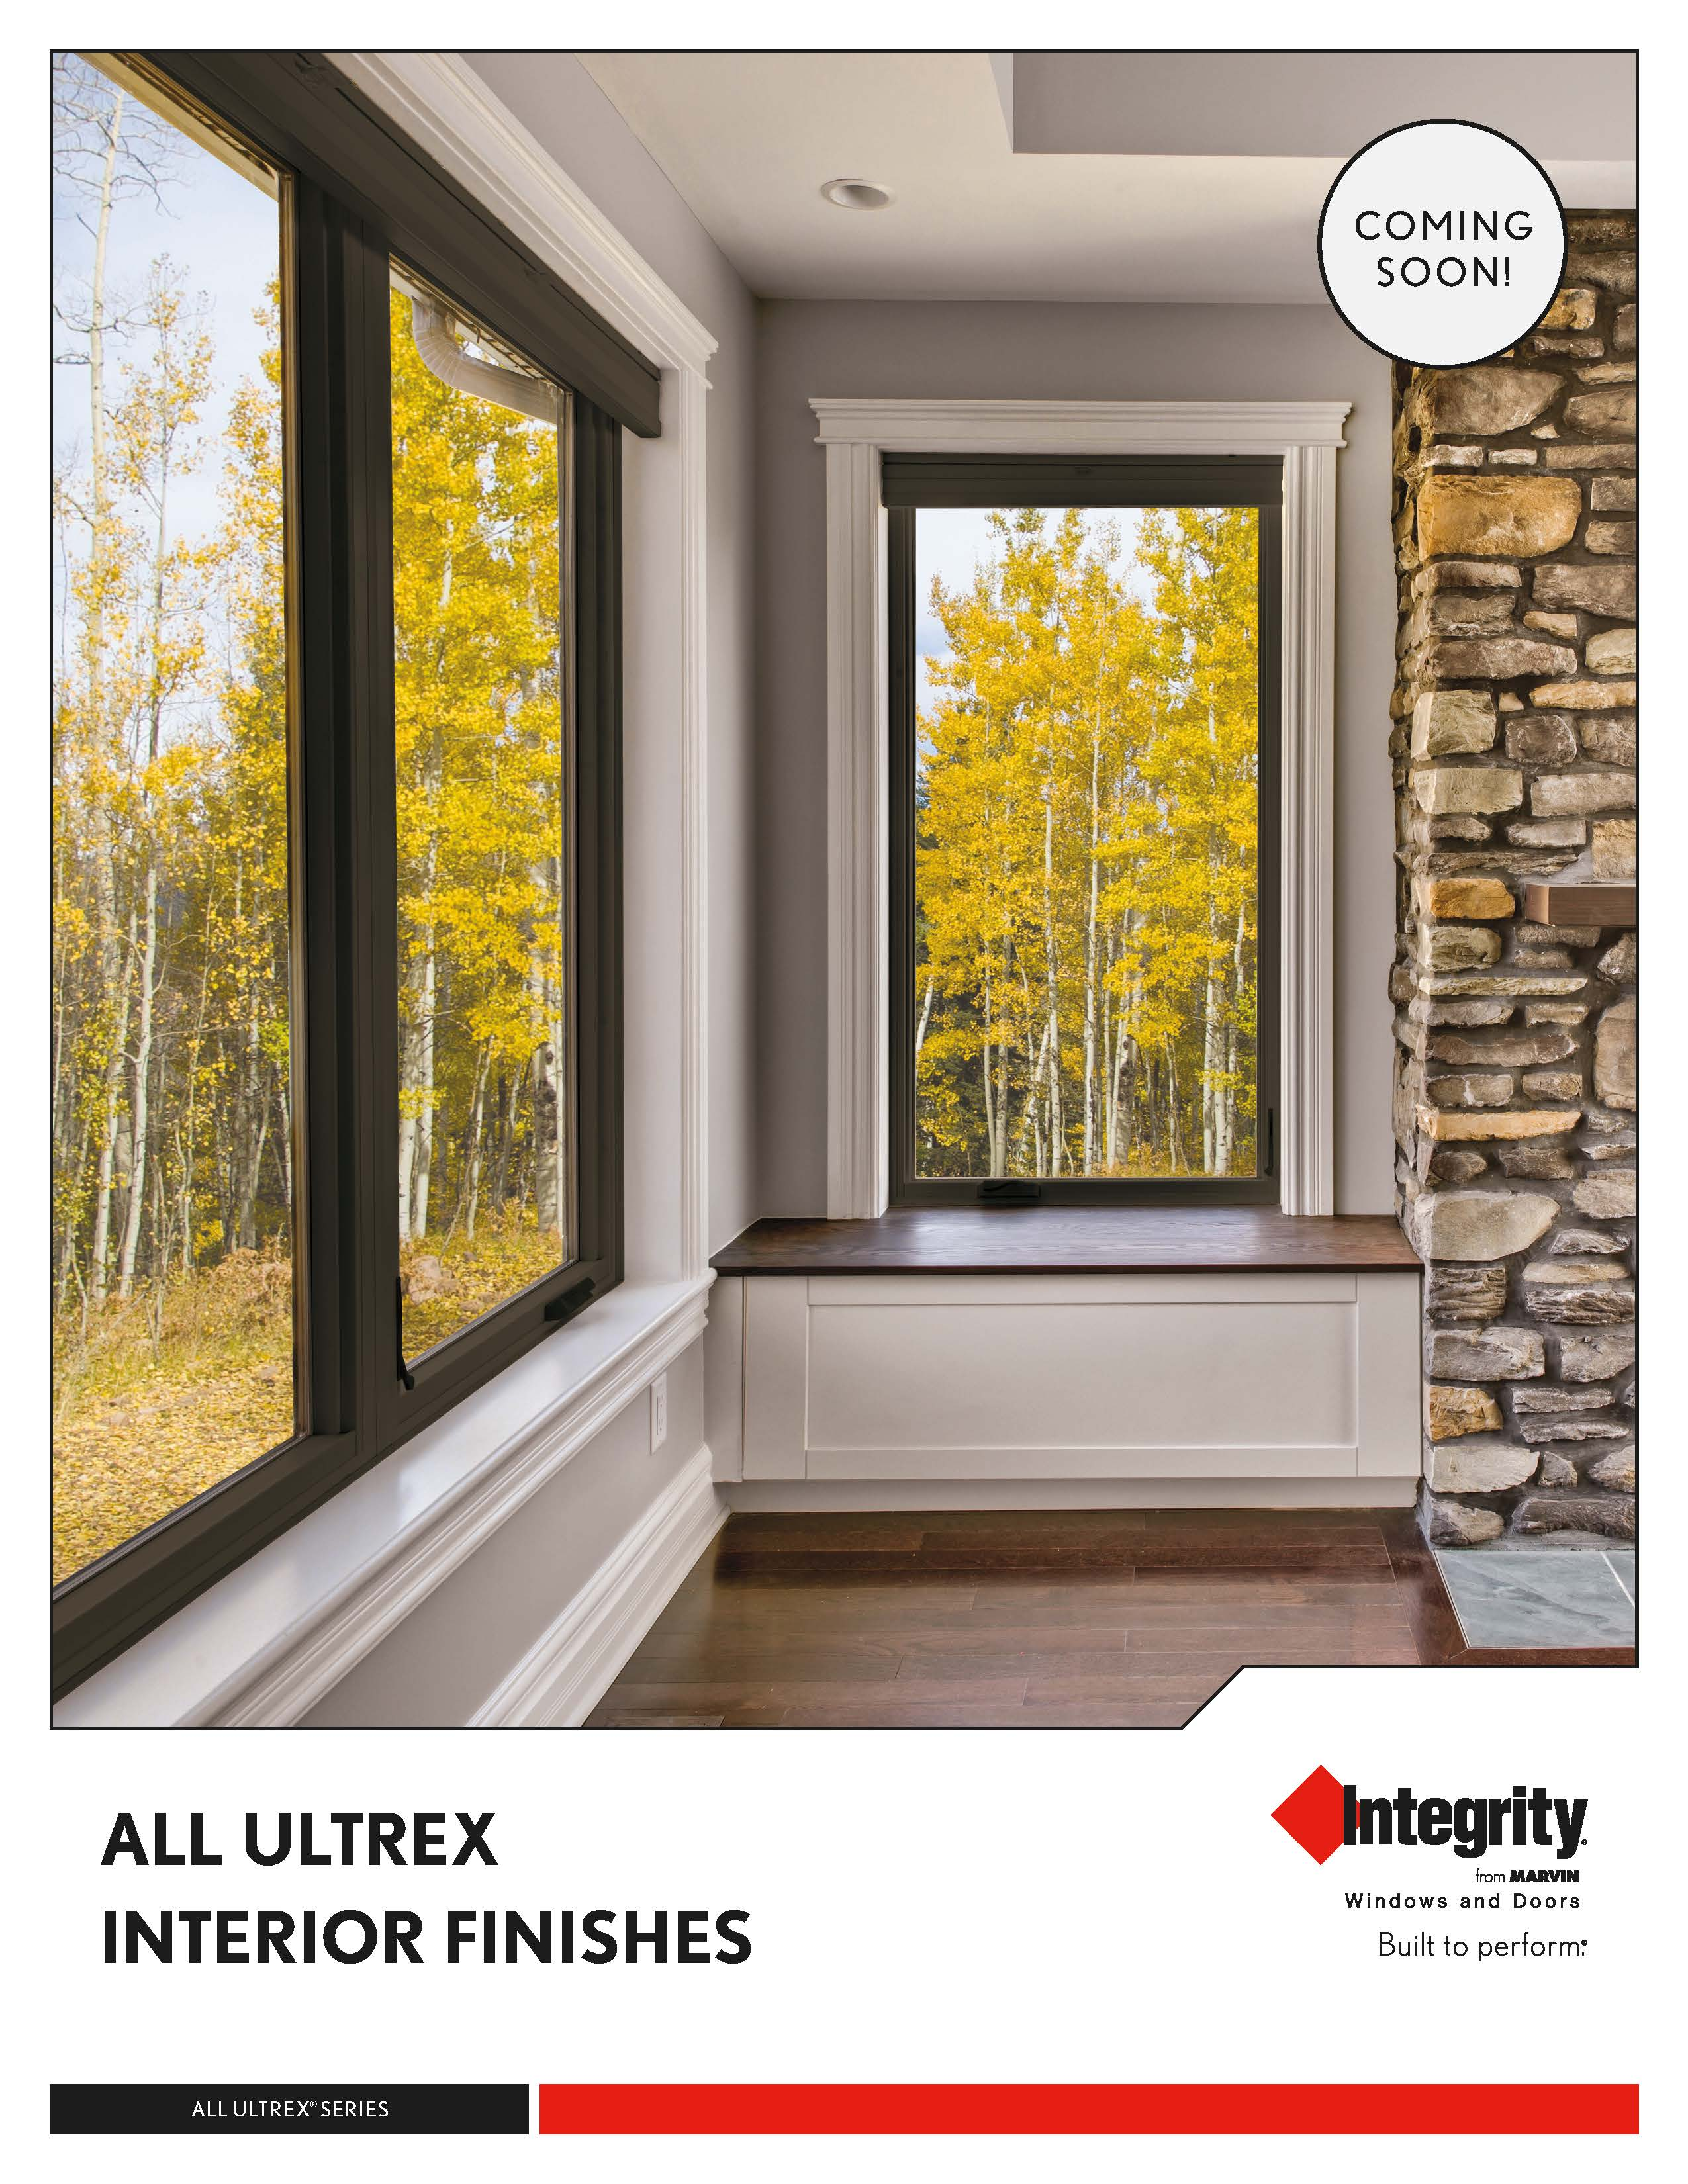 Integrity all ultrex dark interiors sell sheet page 1 jpg